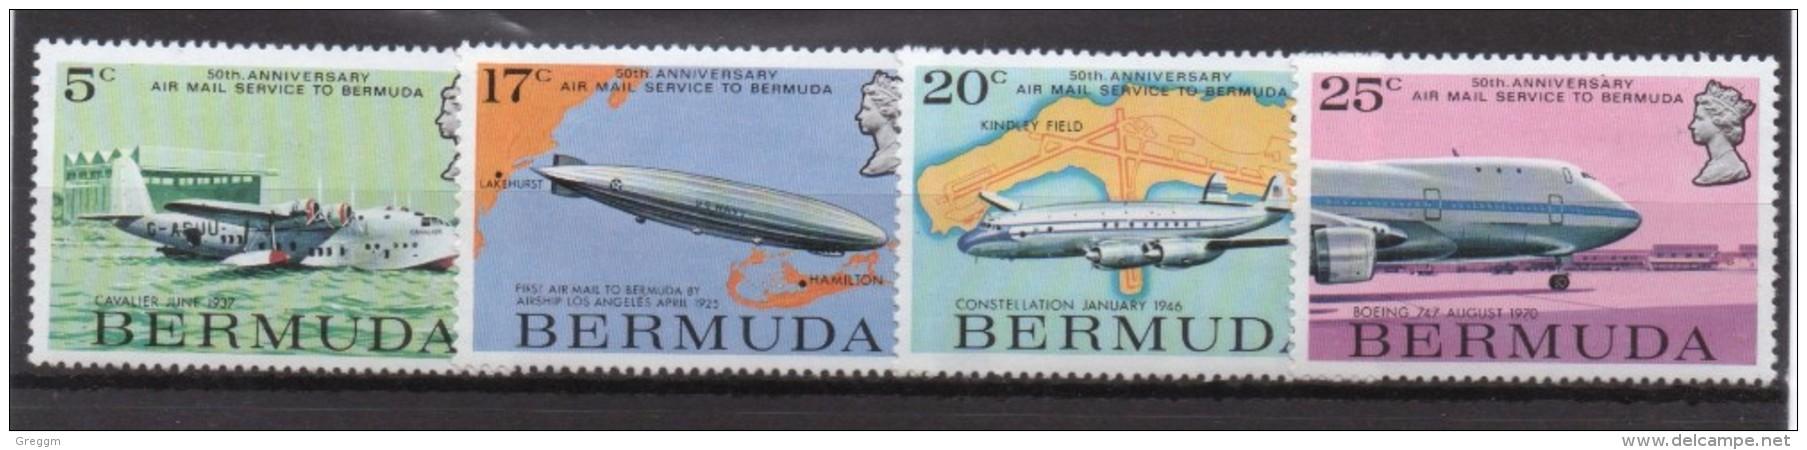 Bermuda Unmounted Mint Set Of Stamps Issued In 1975 - Bermuda